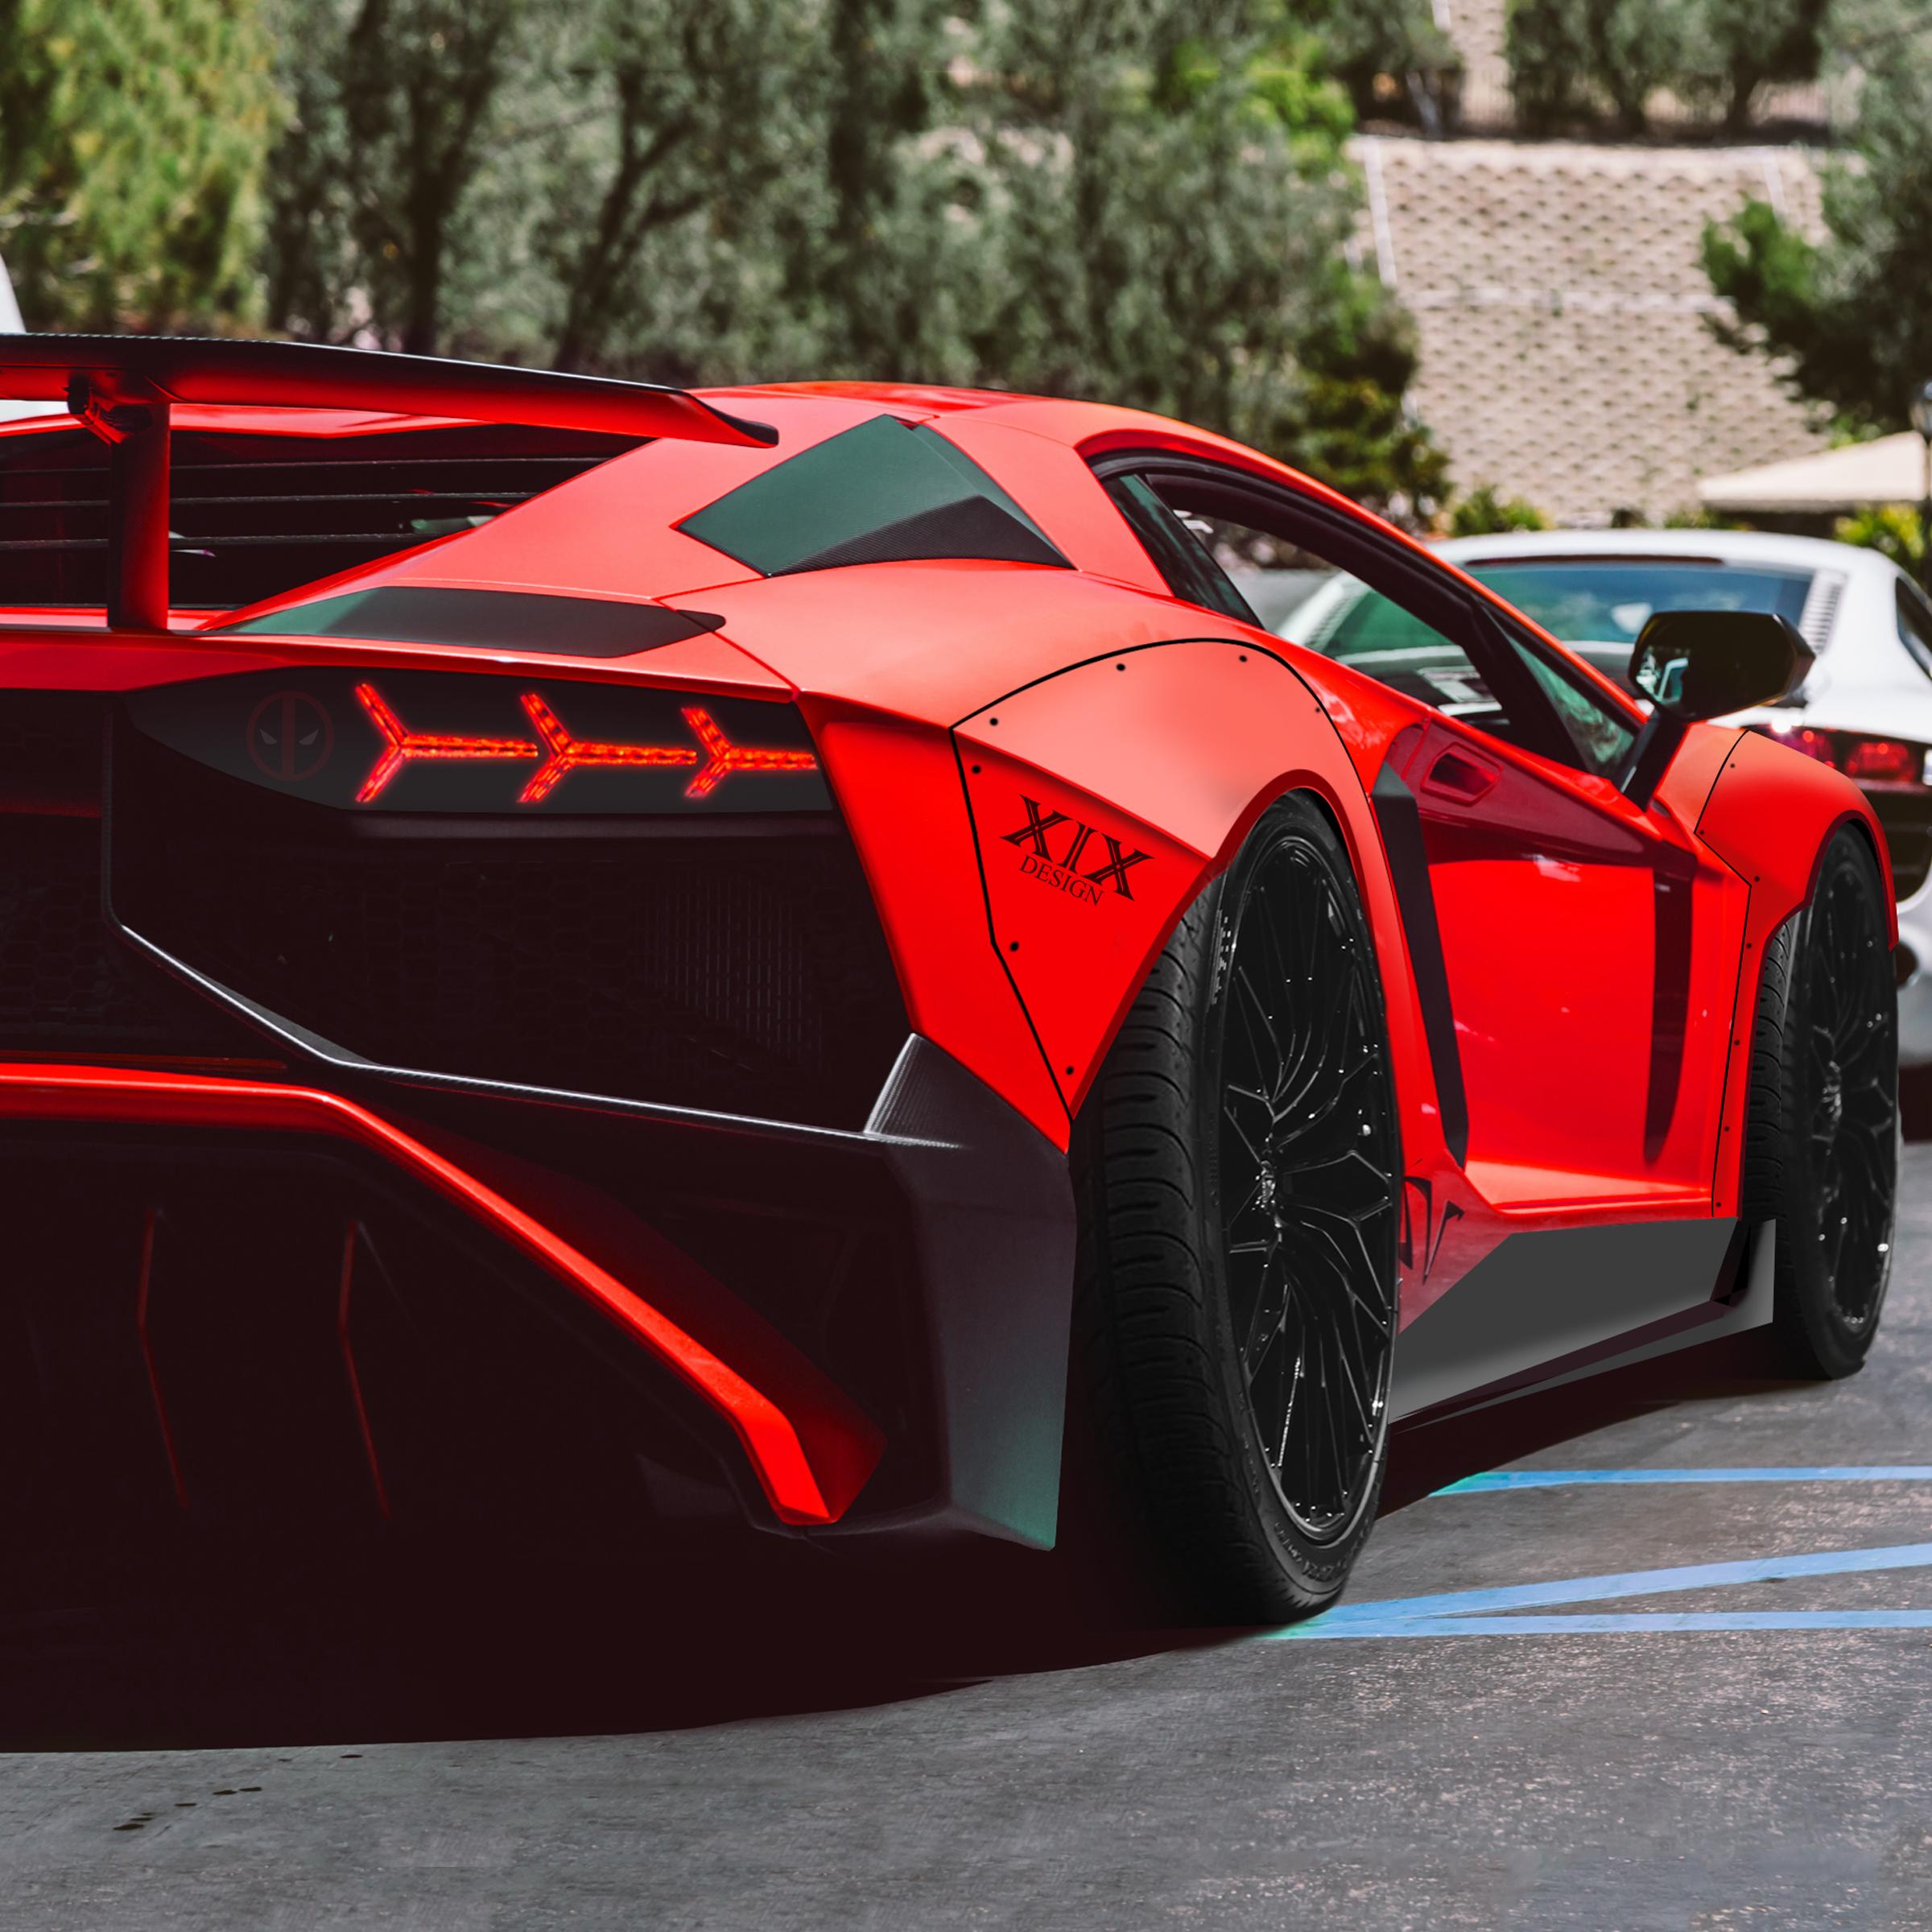 Lamborghini Aventador SV #SuperCar